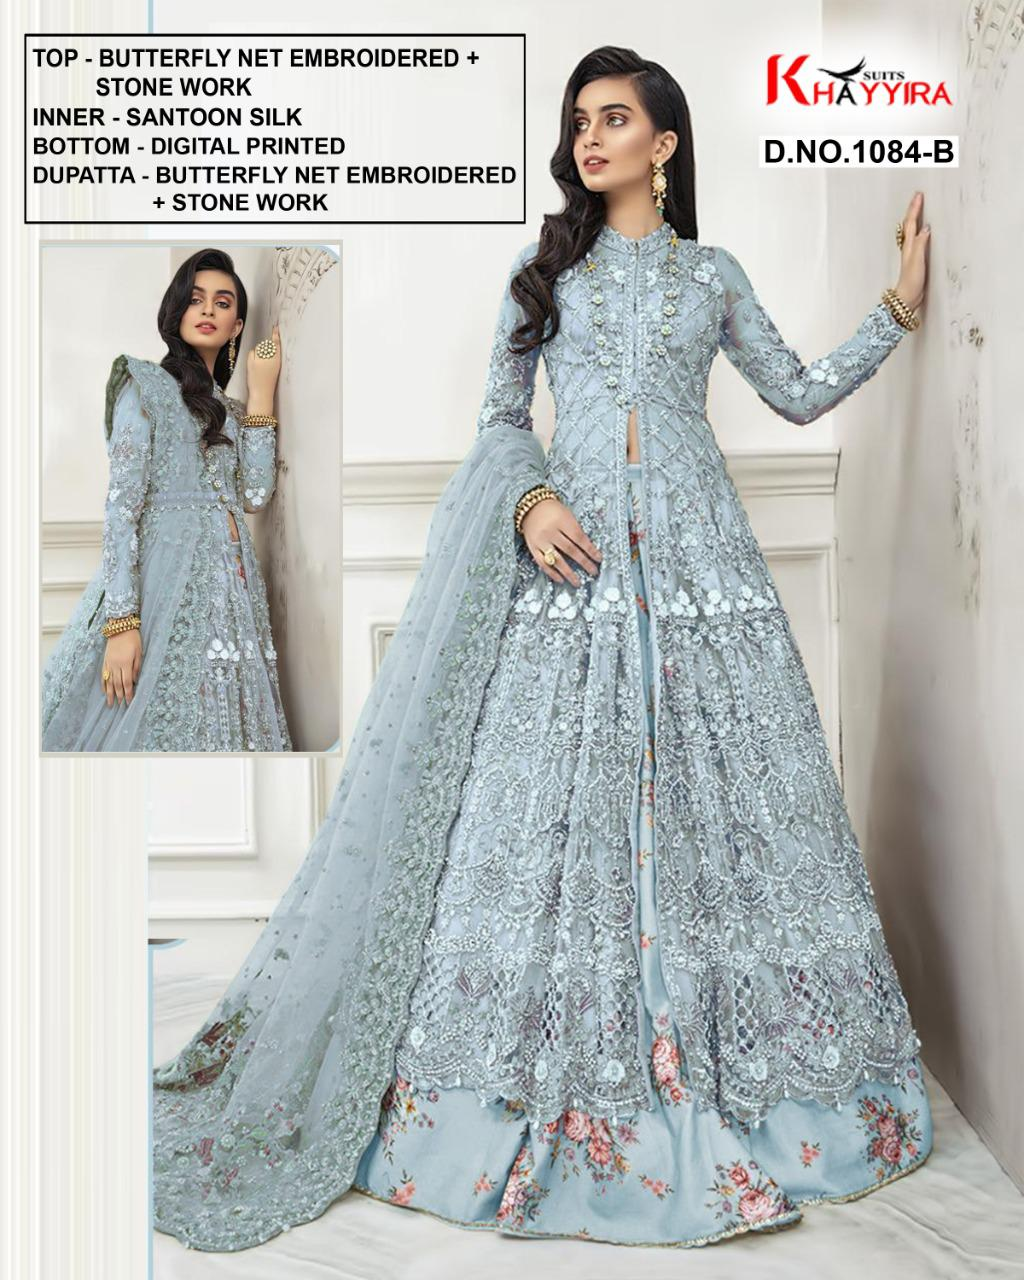 Khayyira DN 1084 Salwar Suit Wholesale Catalog 4 Pcs 2 - Khayyira DN 1084 Salwar Suit Wholesale Catalog 4 Pcs